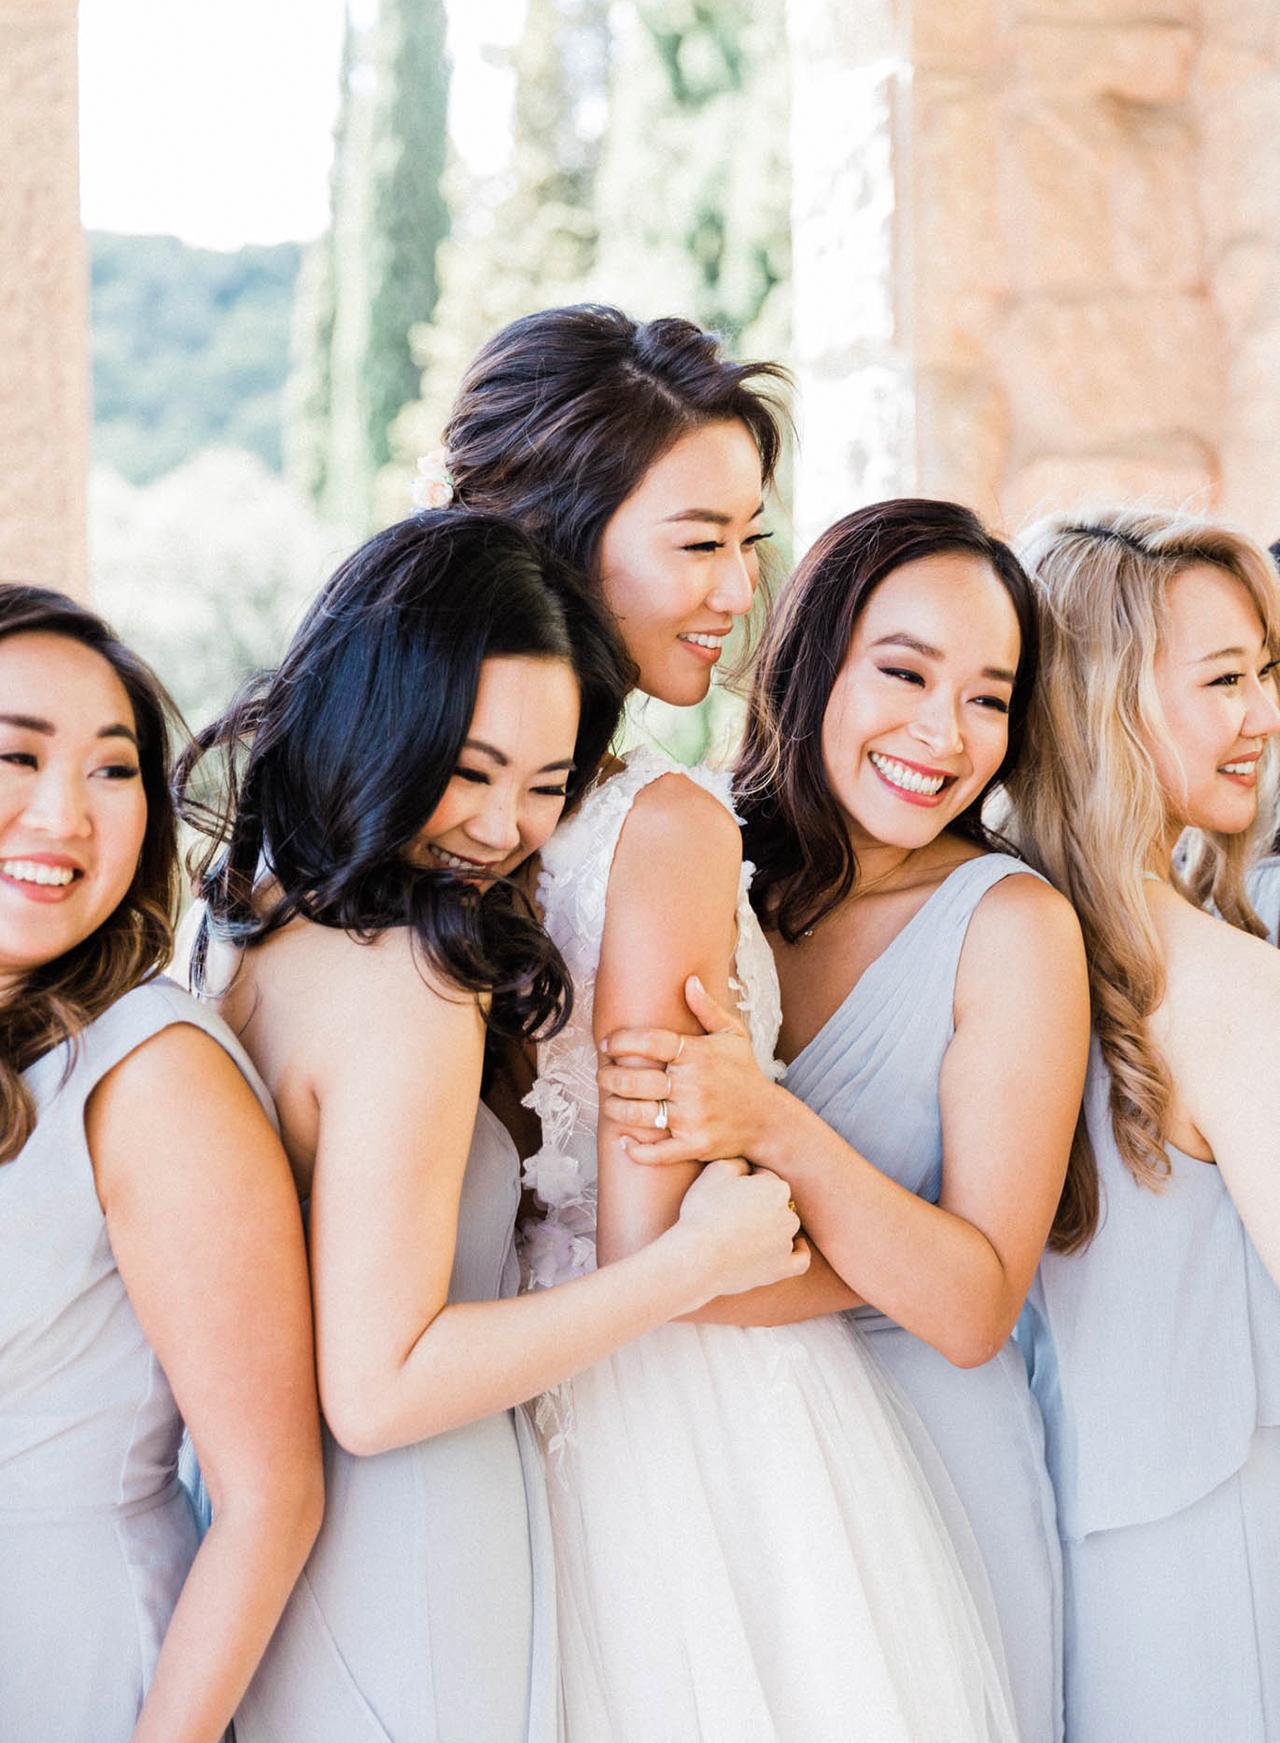 bridesmaids blue chiffon dresses